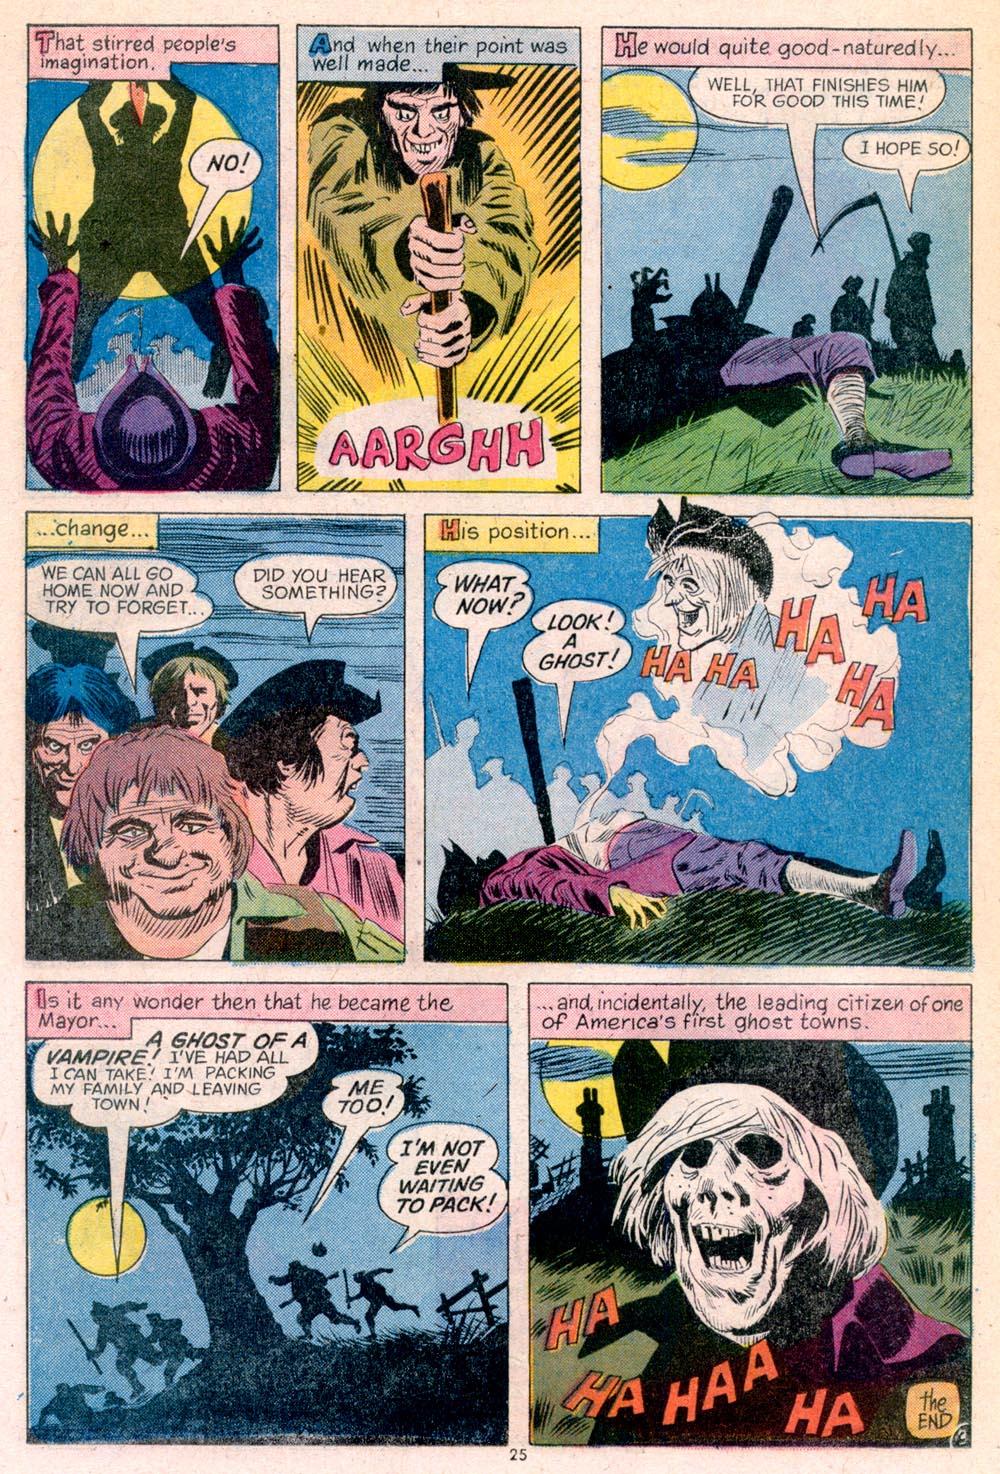 Read online Plop! comic -  Issue #5 - 26